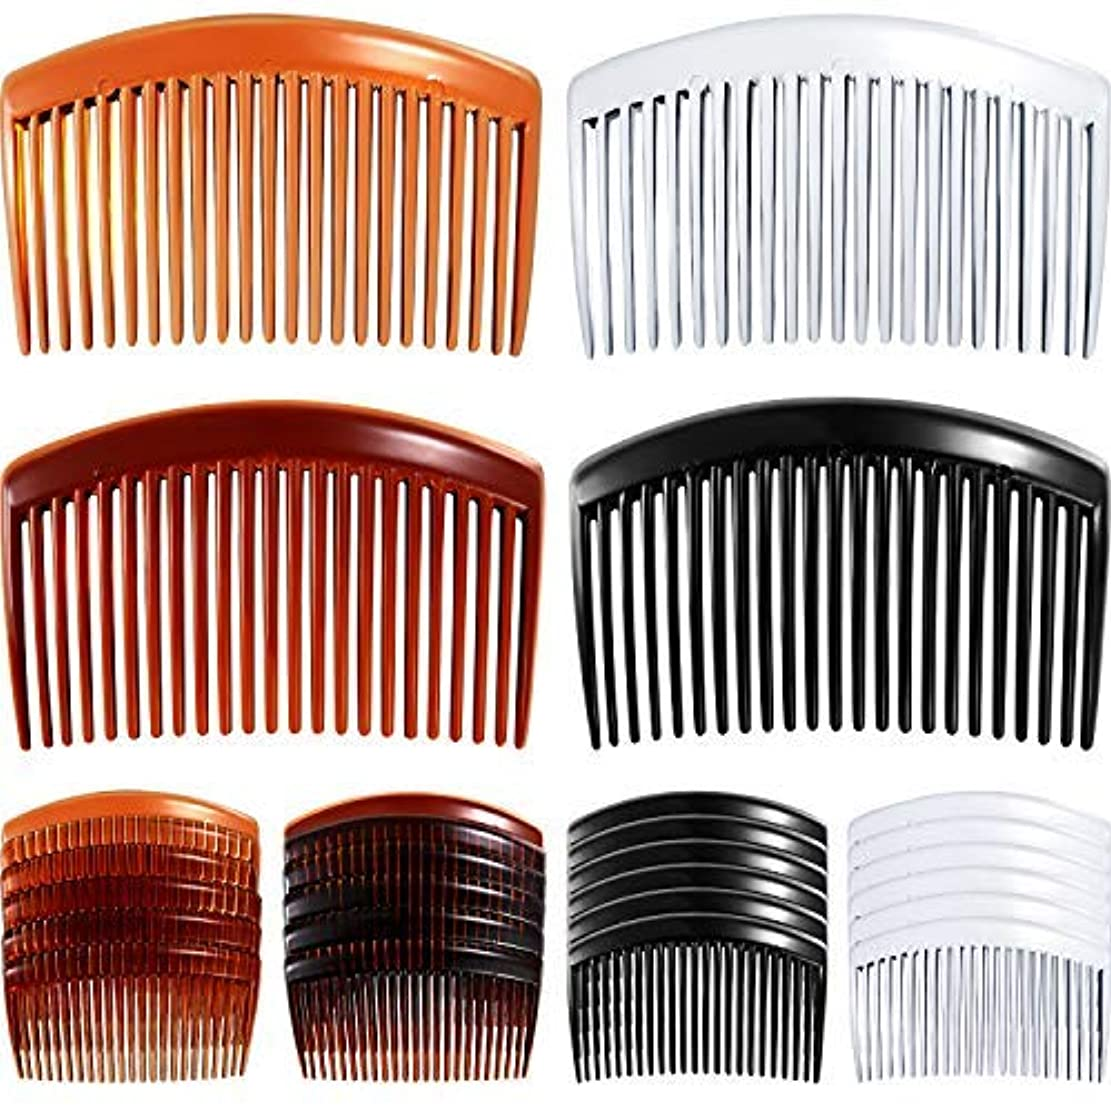 24 Pieces Hair Comb Plastic Hair Side Combs Straight Teeth Hair Clip Comb Bridal Wedding Veil Comb for Fine Hair...